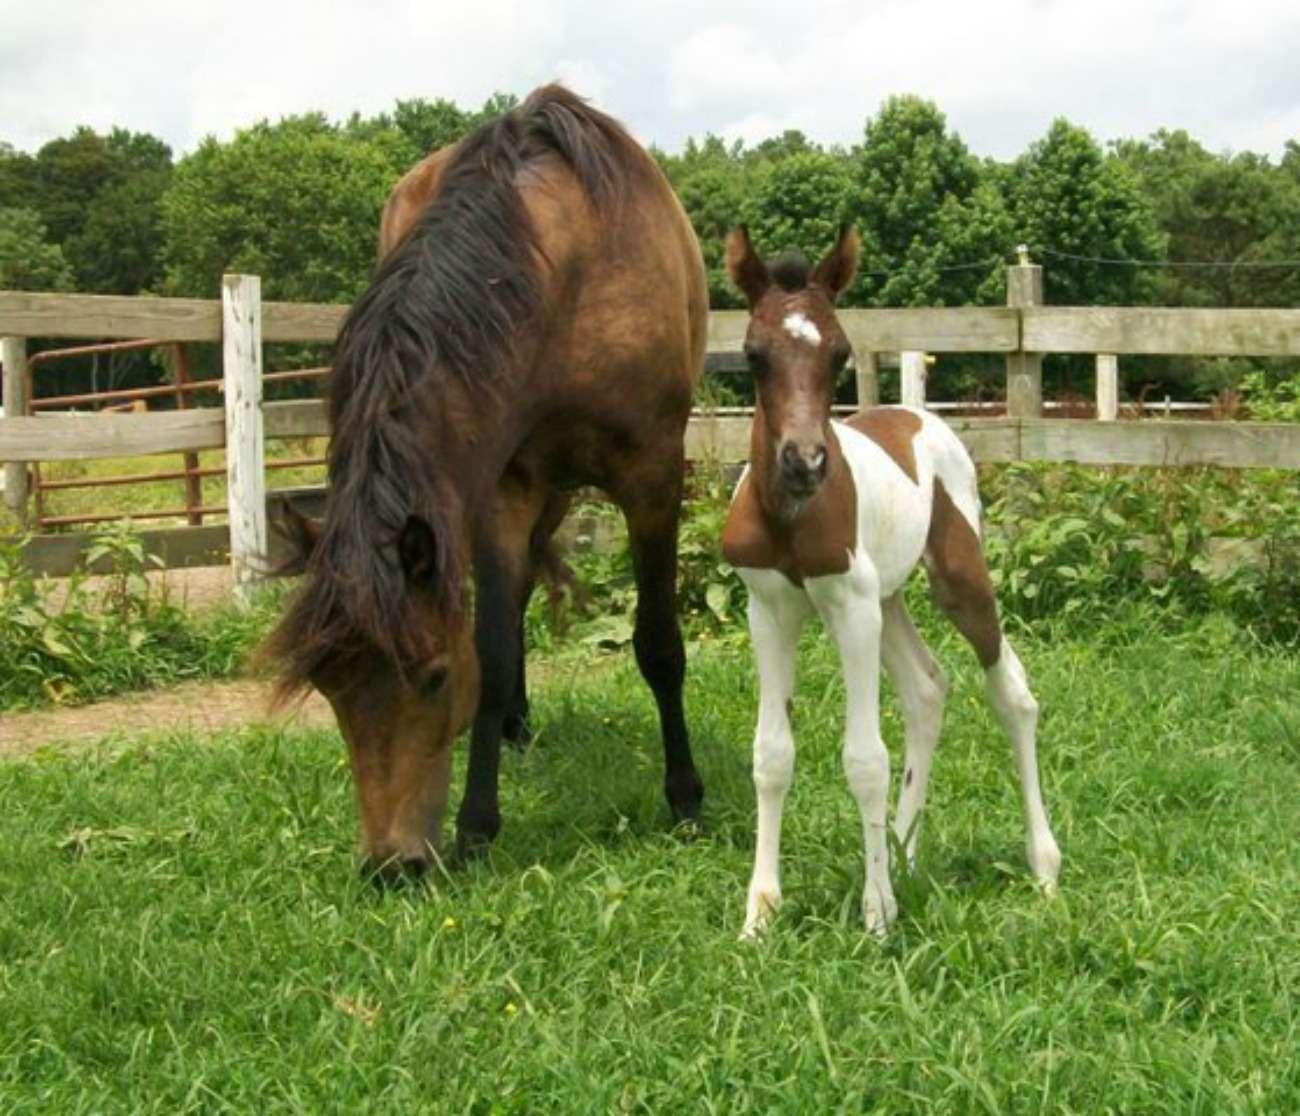 Ponies at Chincoteague Pony Centre